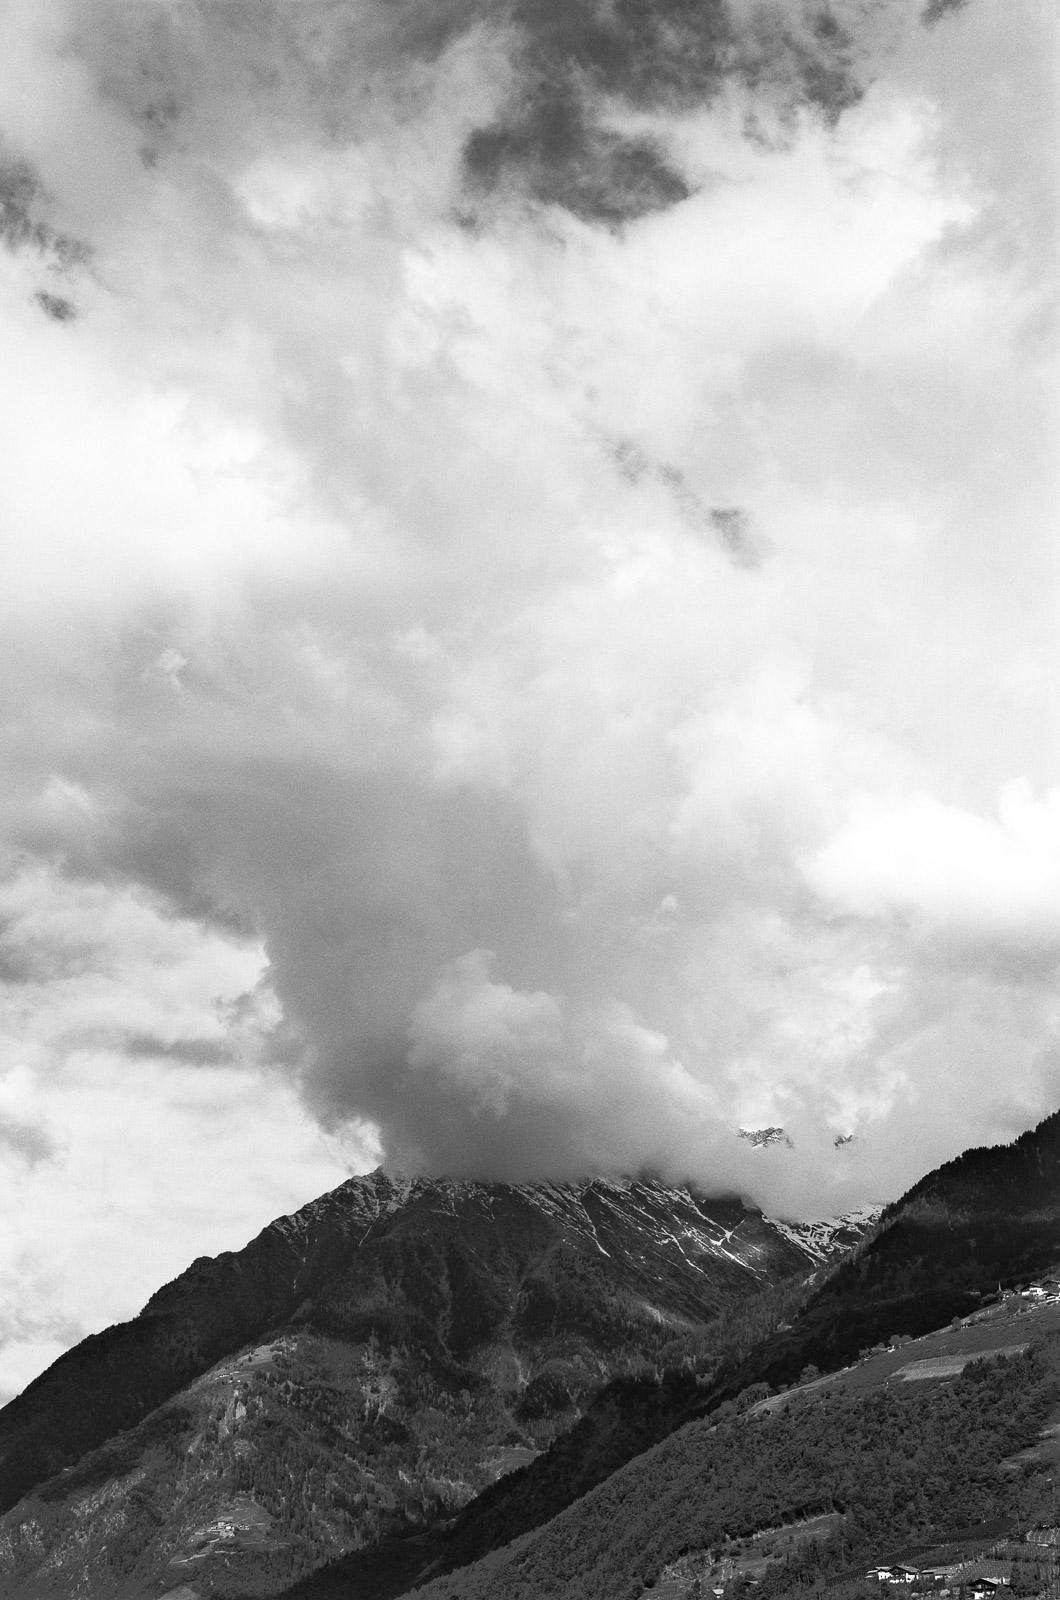 Clearing rainstorm, Italian Alps